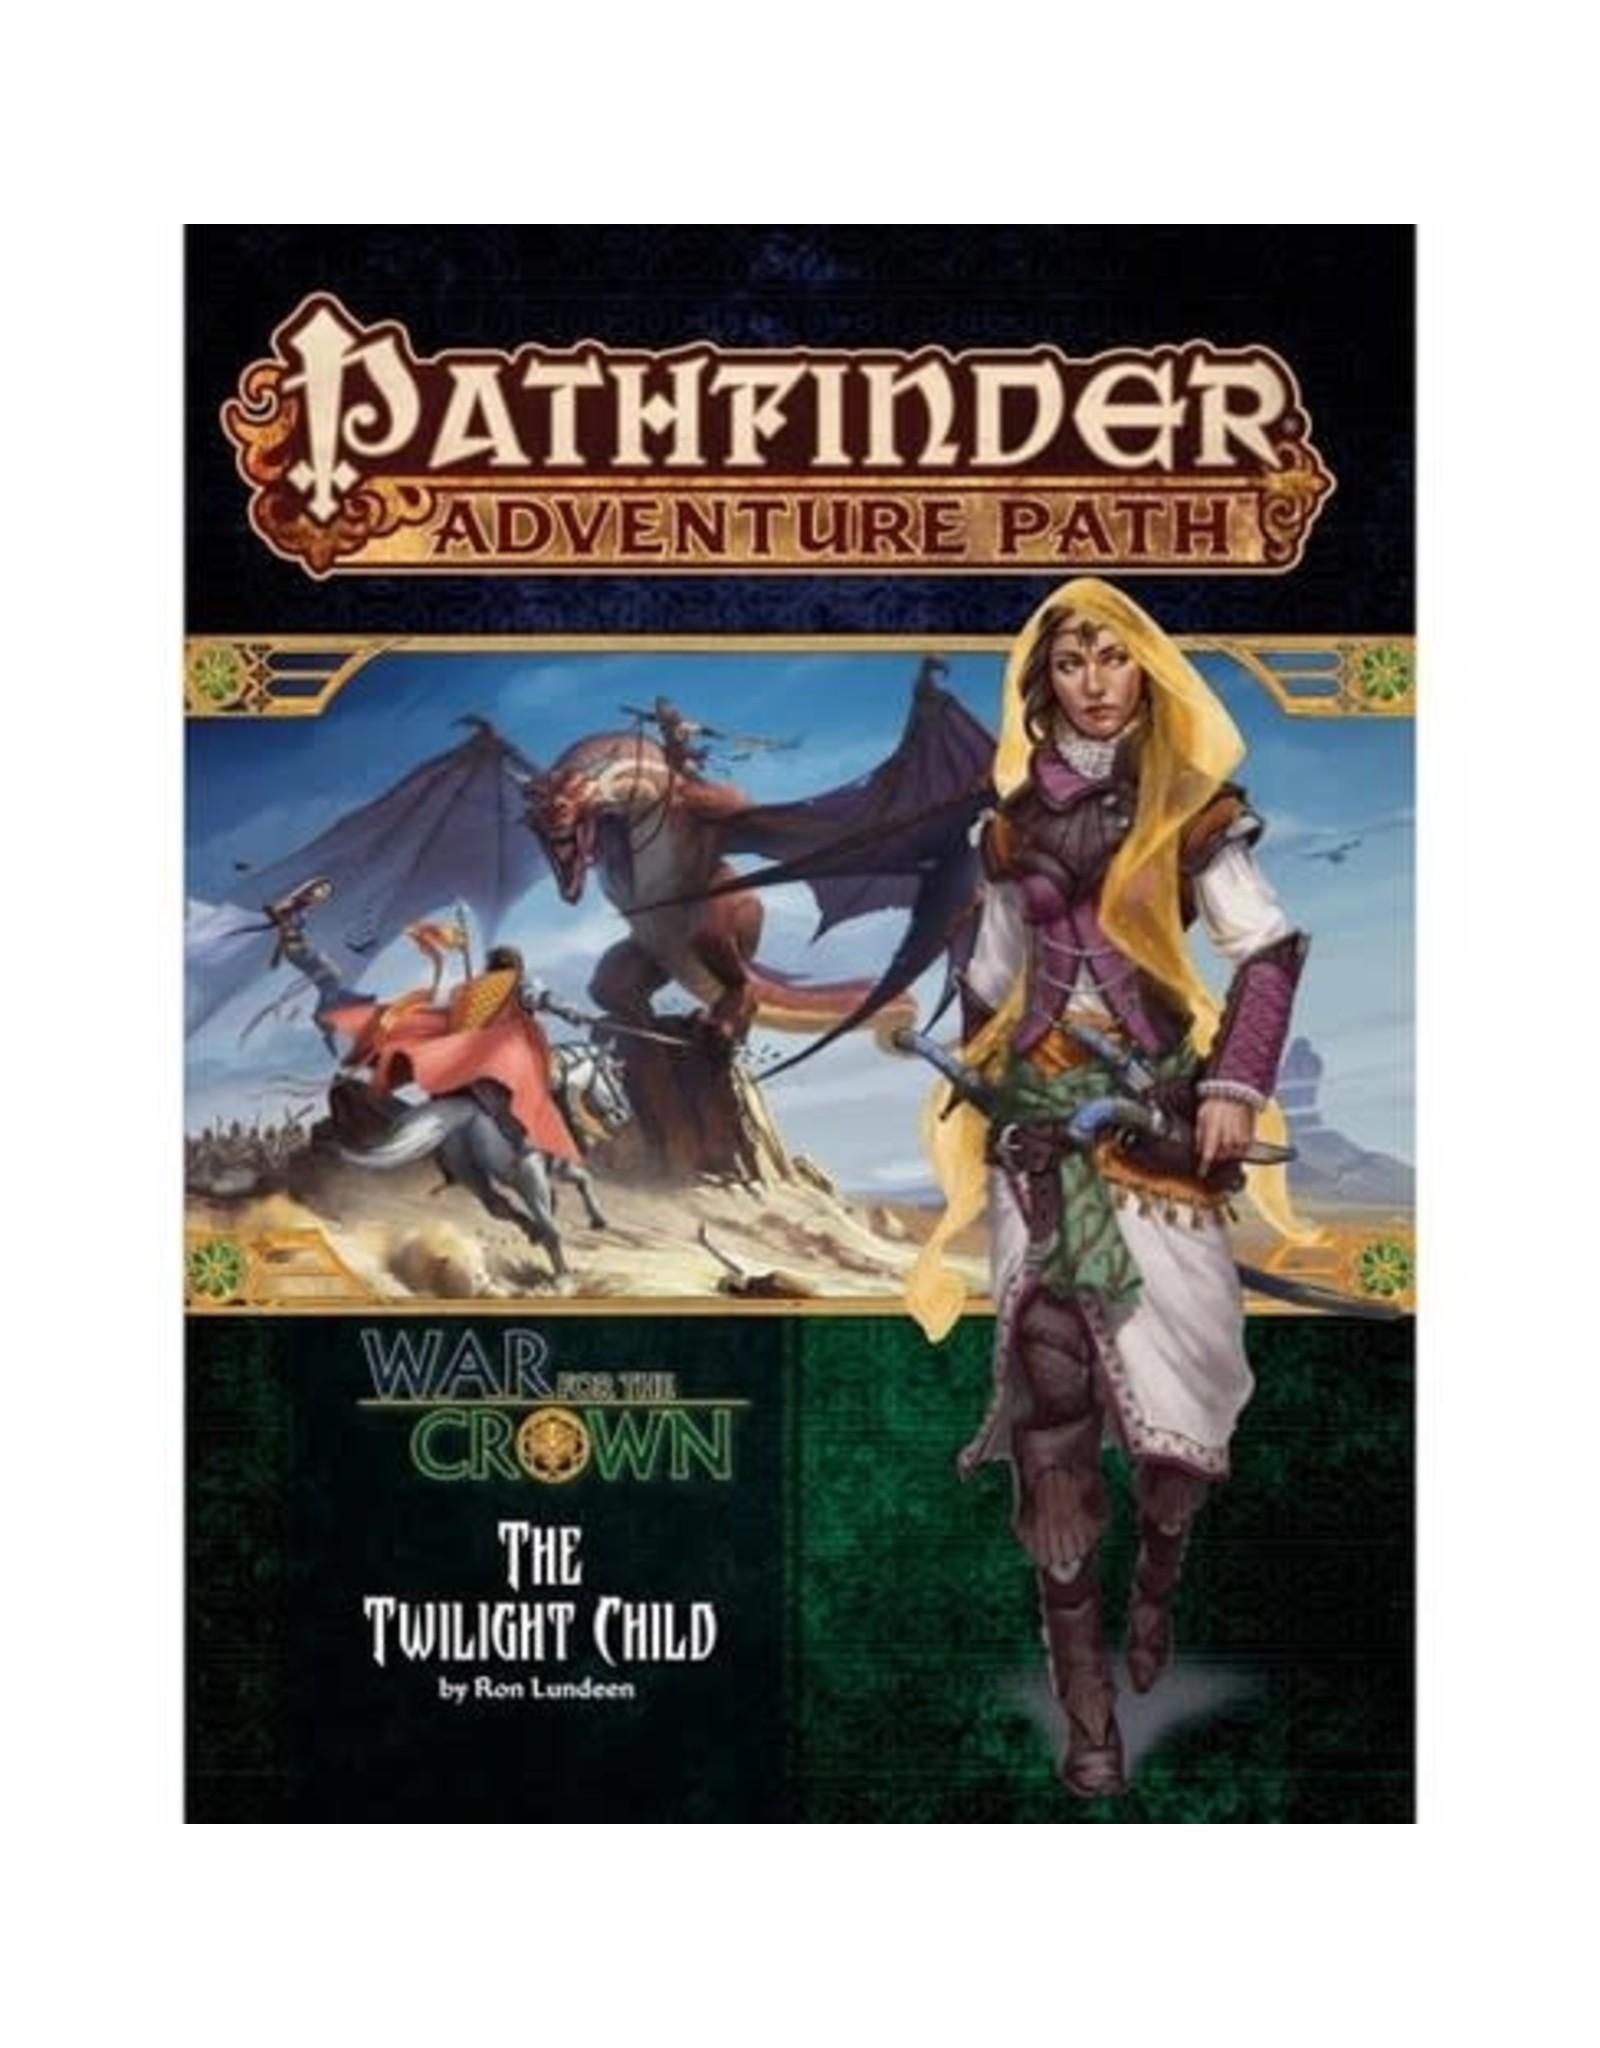 Pathfinder Adventure Path: War for the Crown #3 - Twilight Child